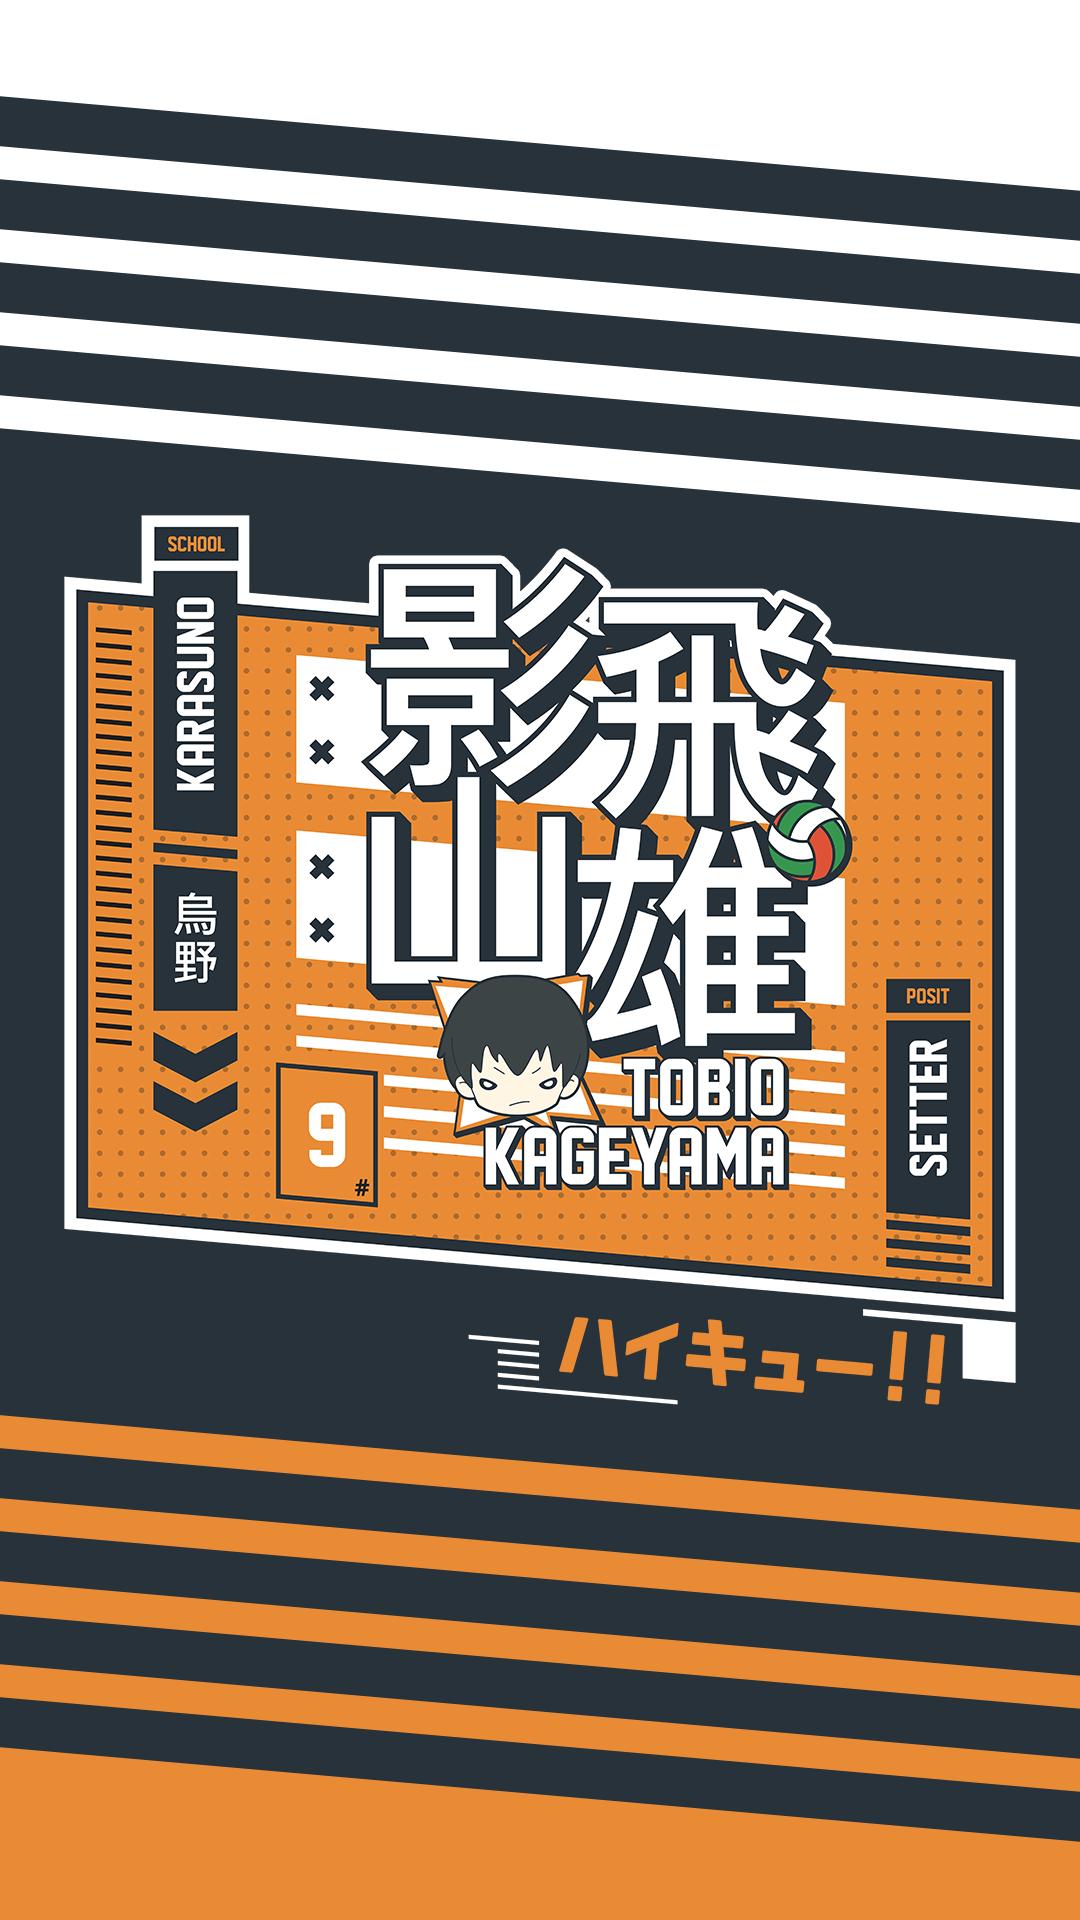 Tobio Kageyama Wallpaper Karasuno In 2020 Haikyuu Wallpaper Anime Wallpaper Iphone Haikyuu Fanart